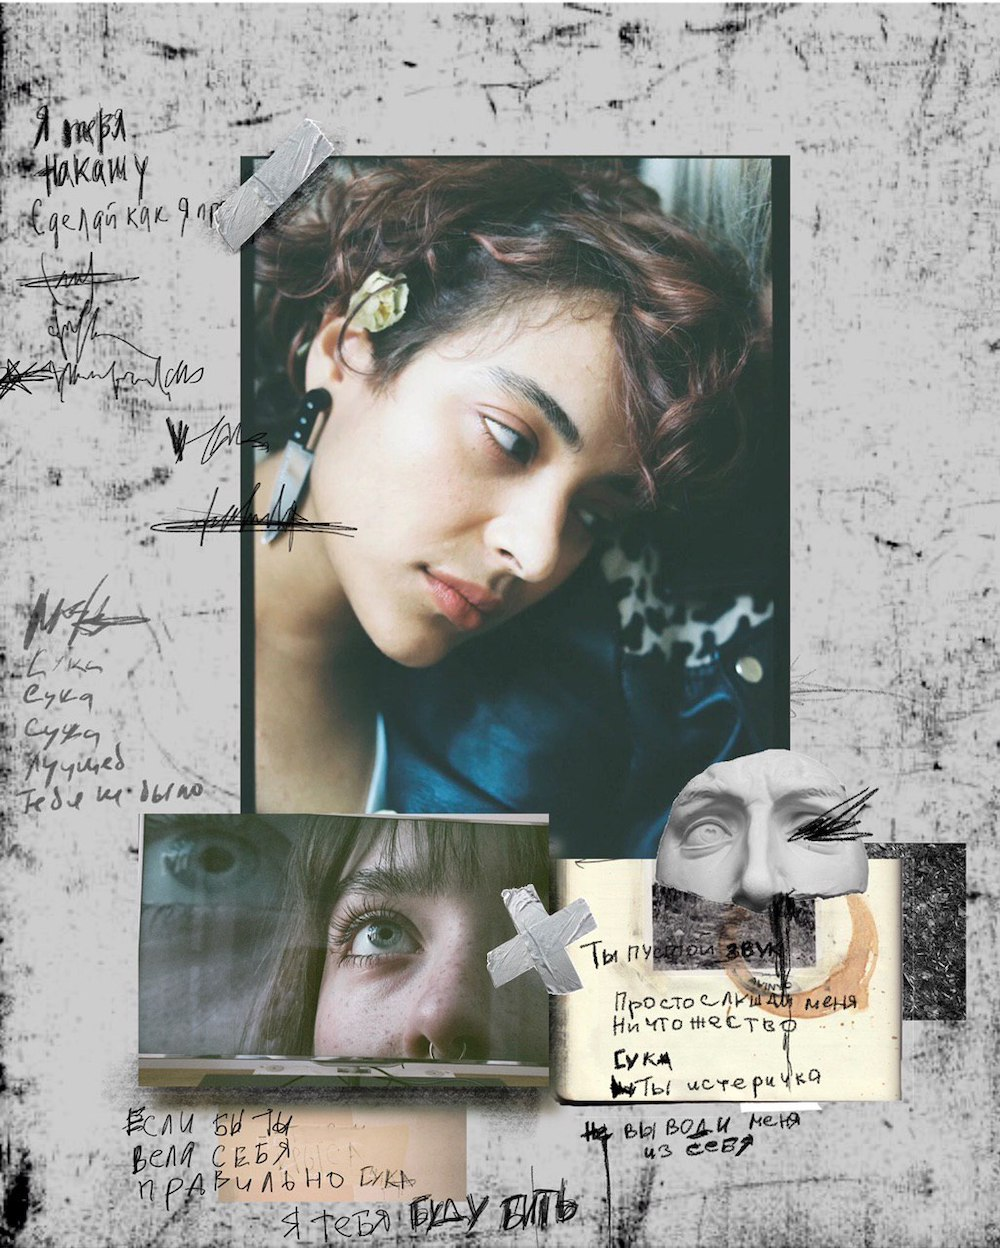 Певица Сабрина — об арт-проекте «Нарцисс» и абьюзе в своей жизни (фото 1)